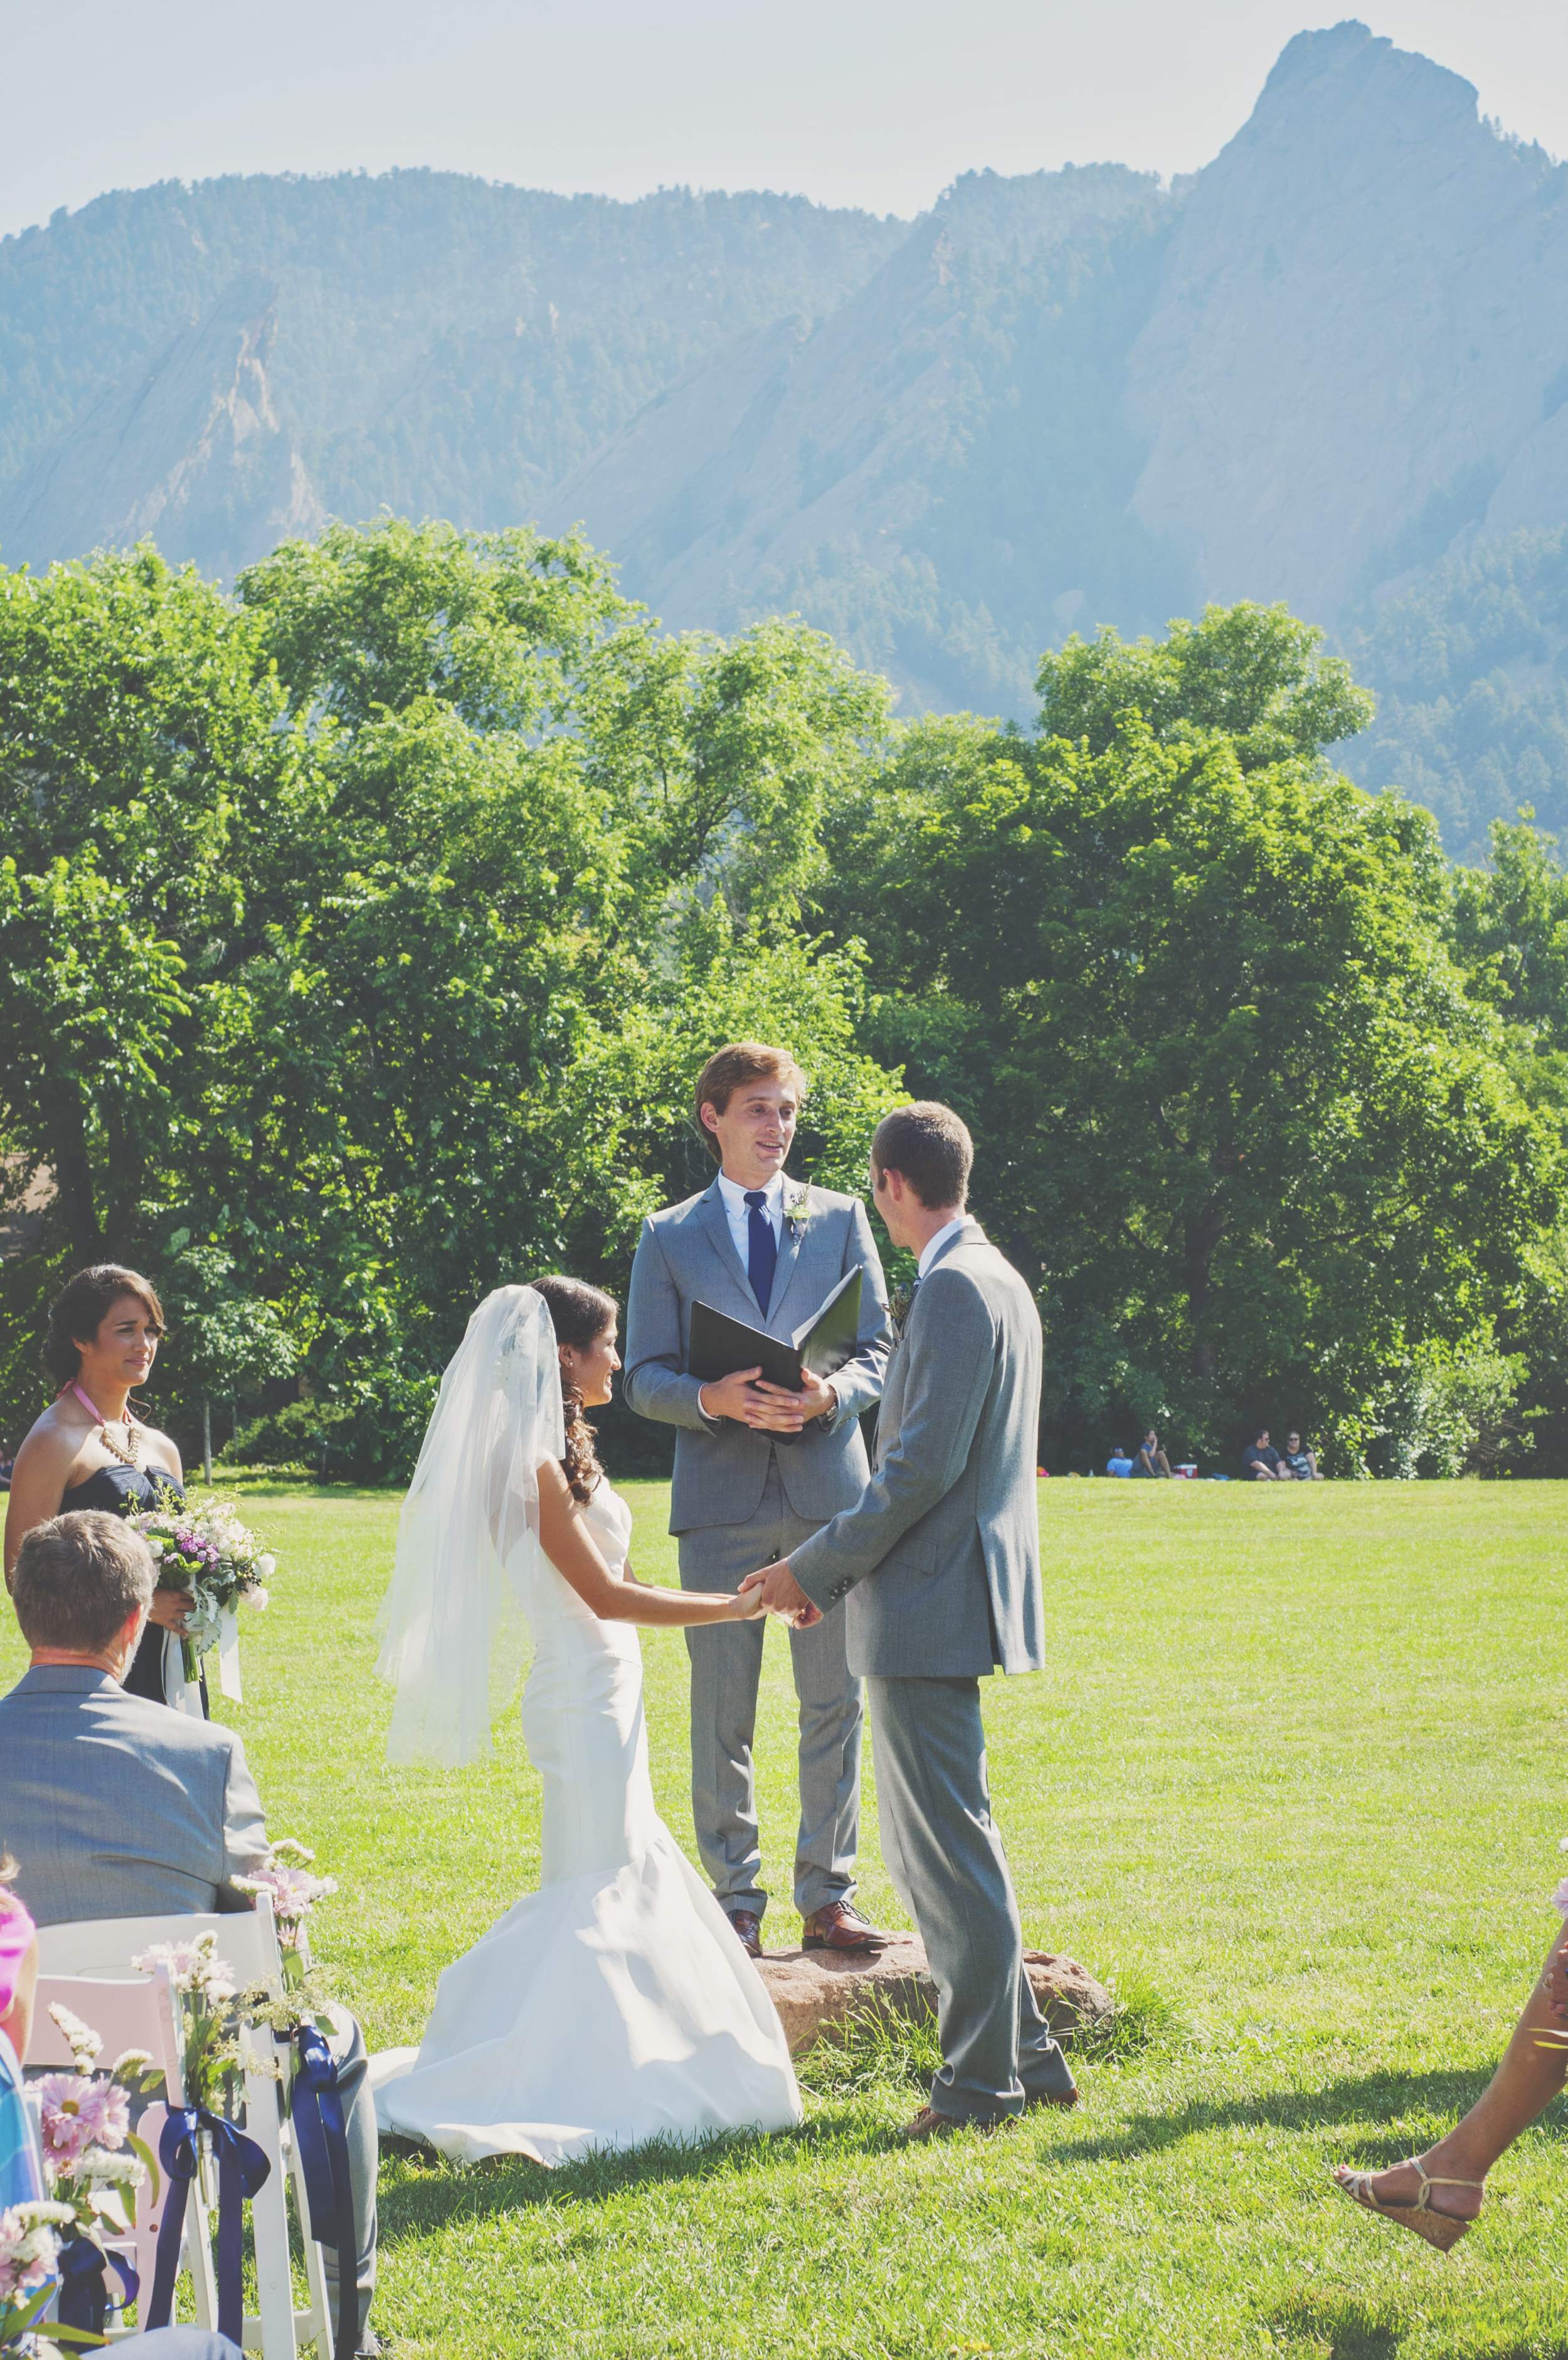 Scoshear Wedding0218-min.jpg